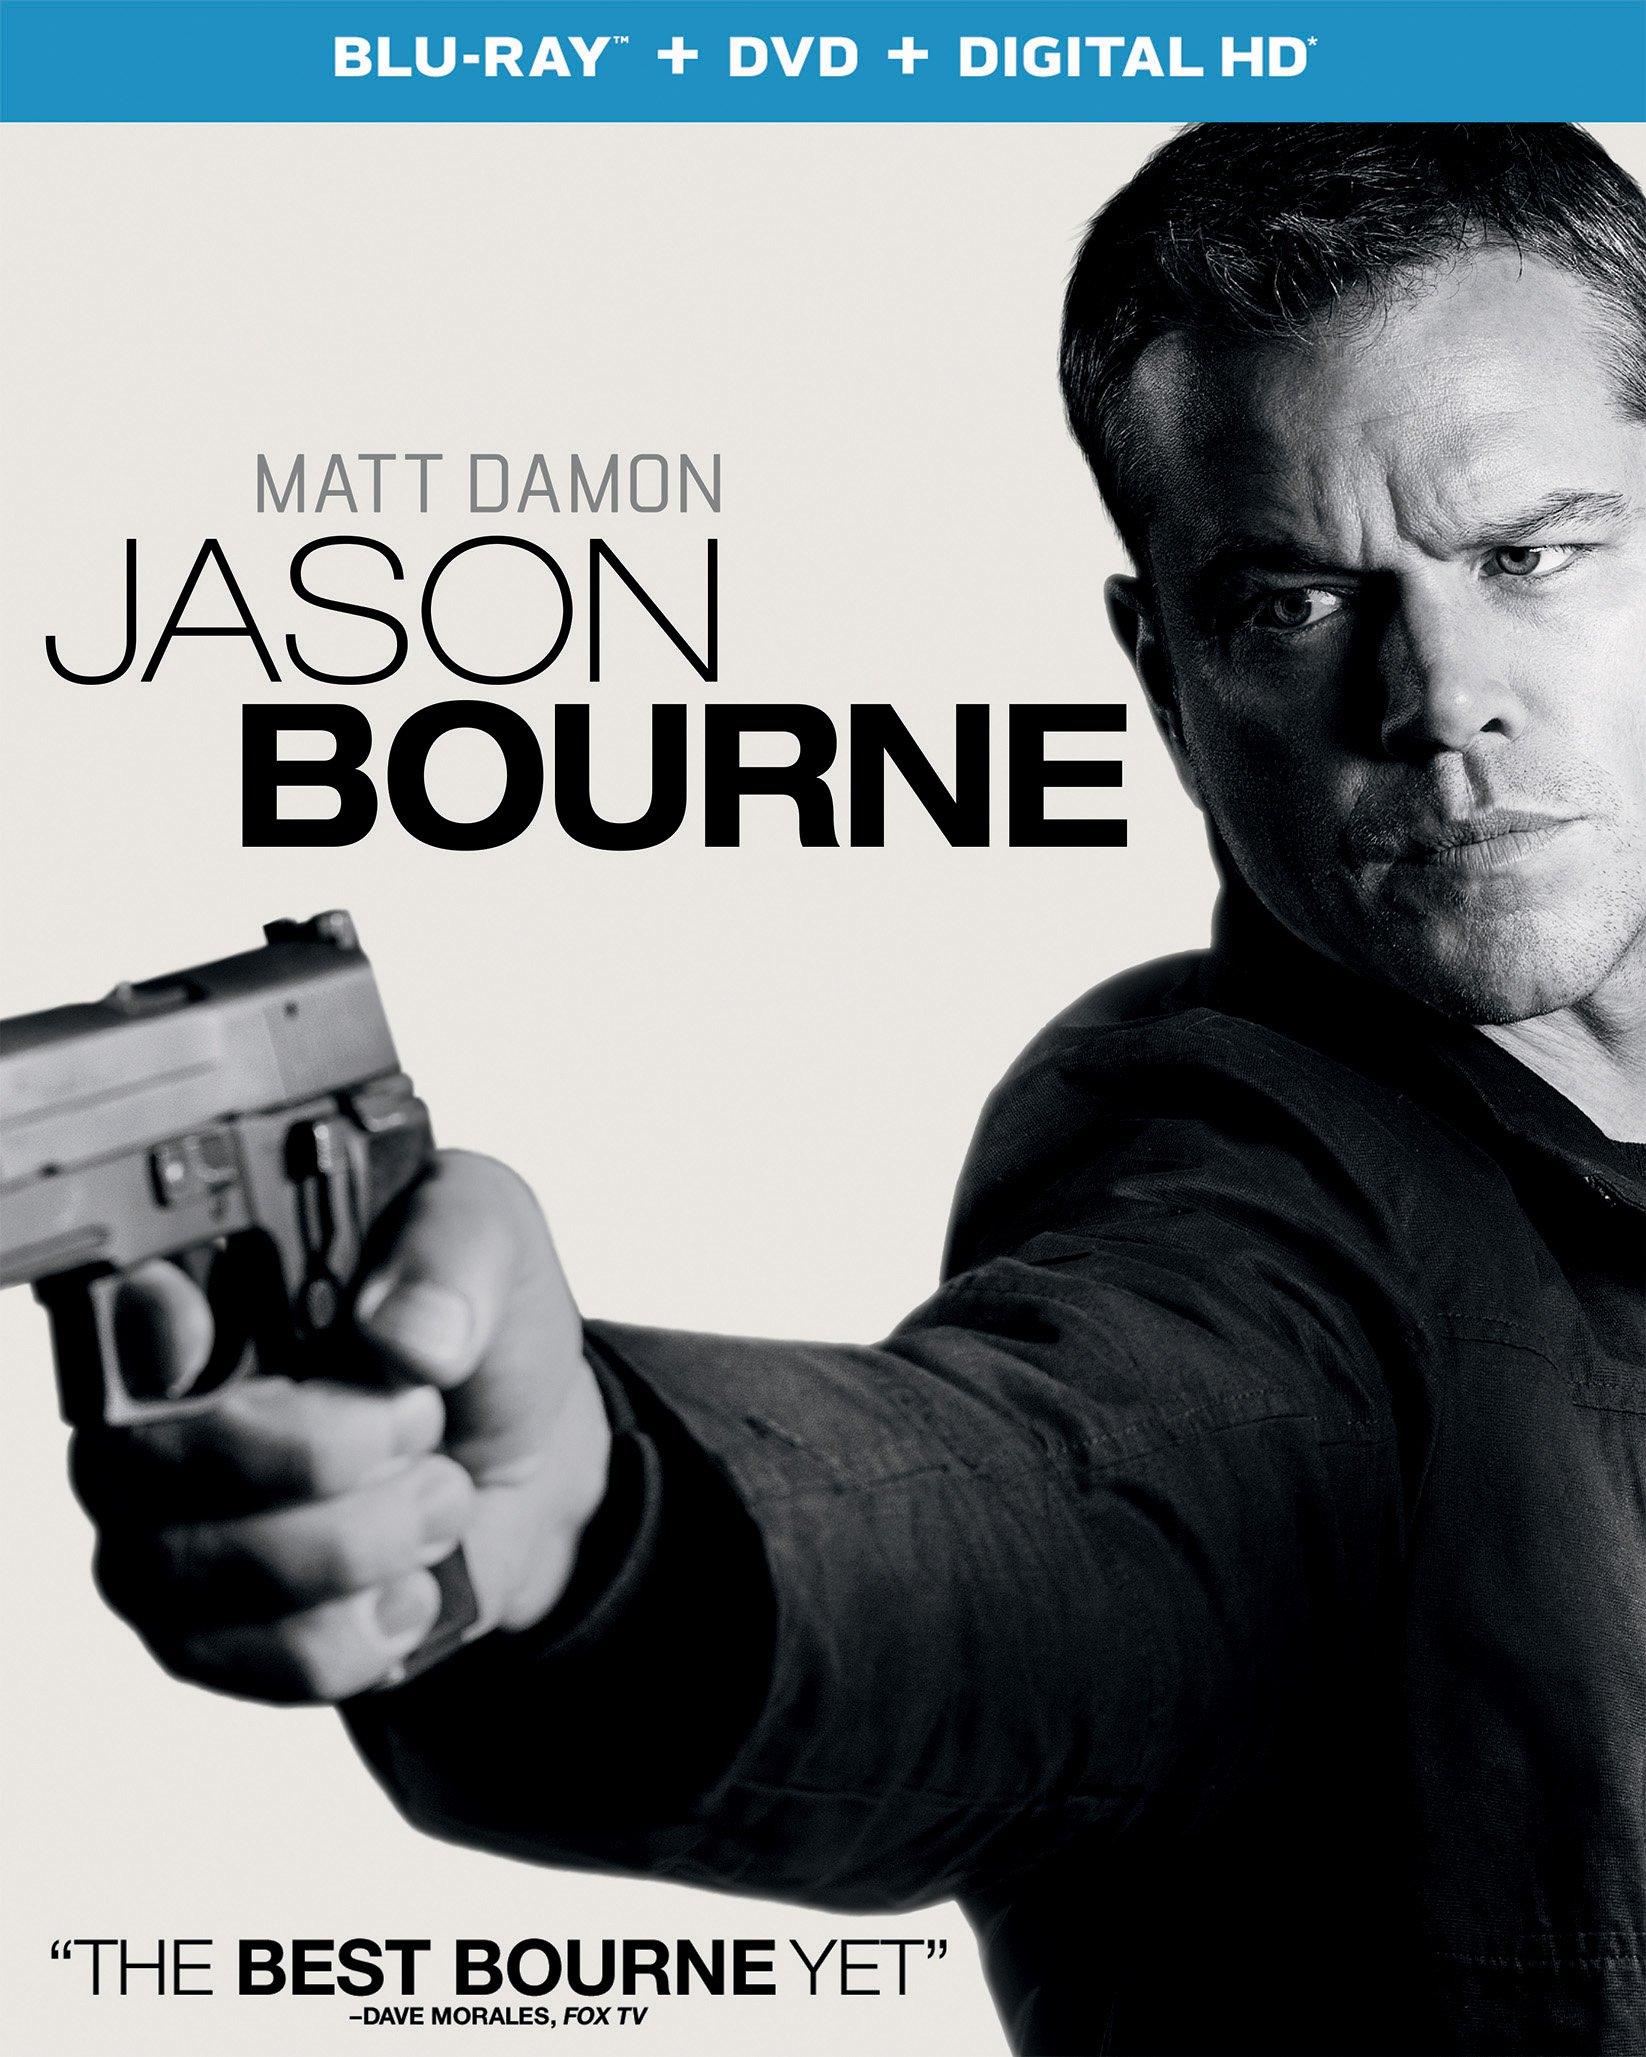 Buy Jason Bourne Now!